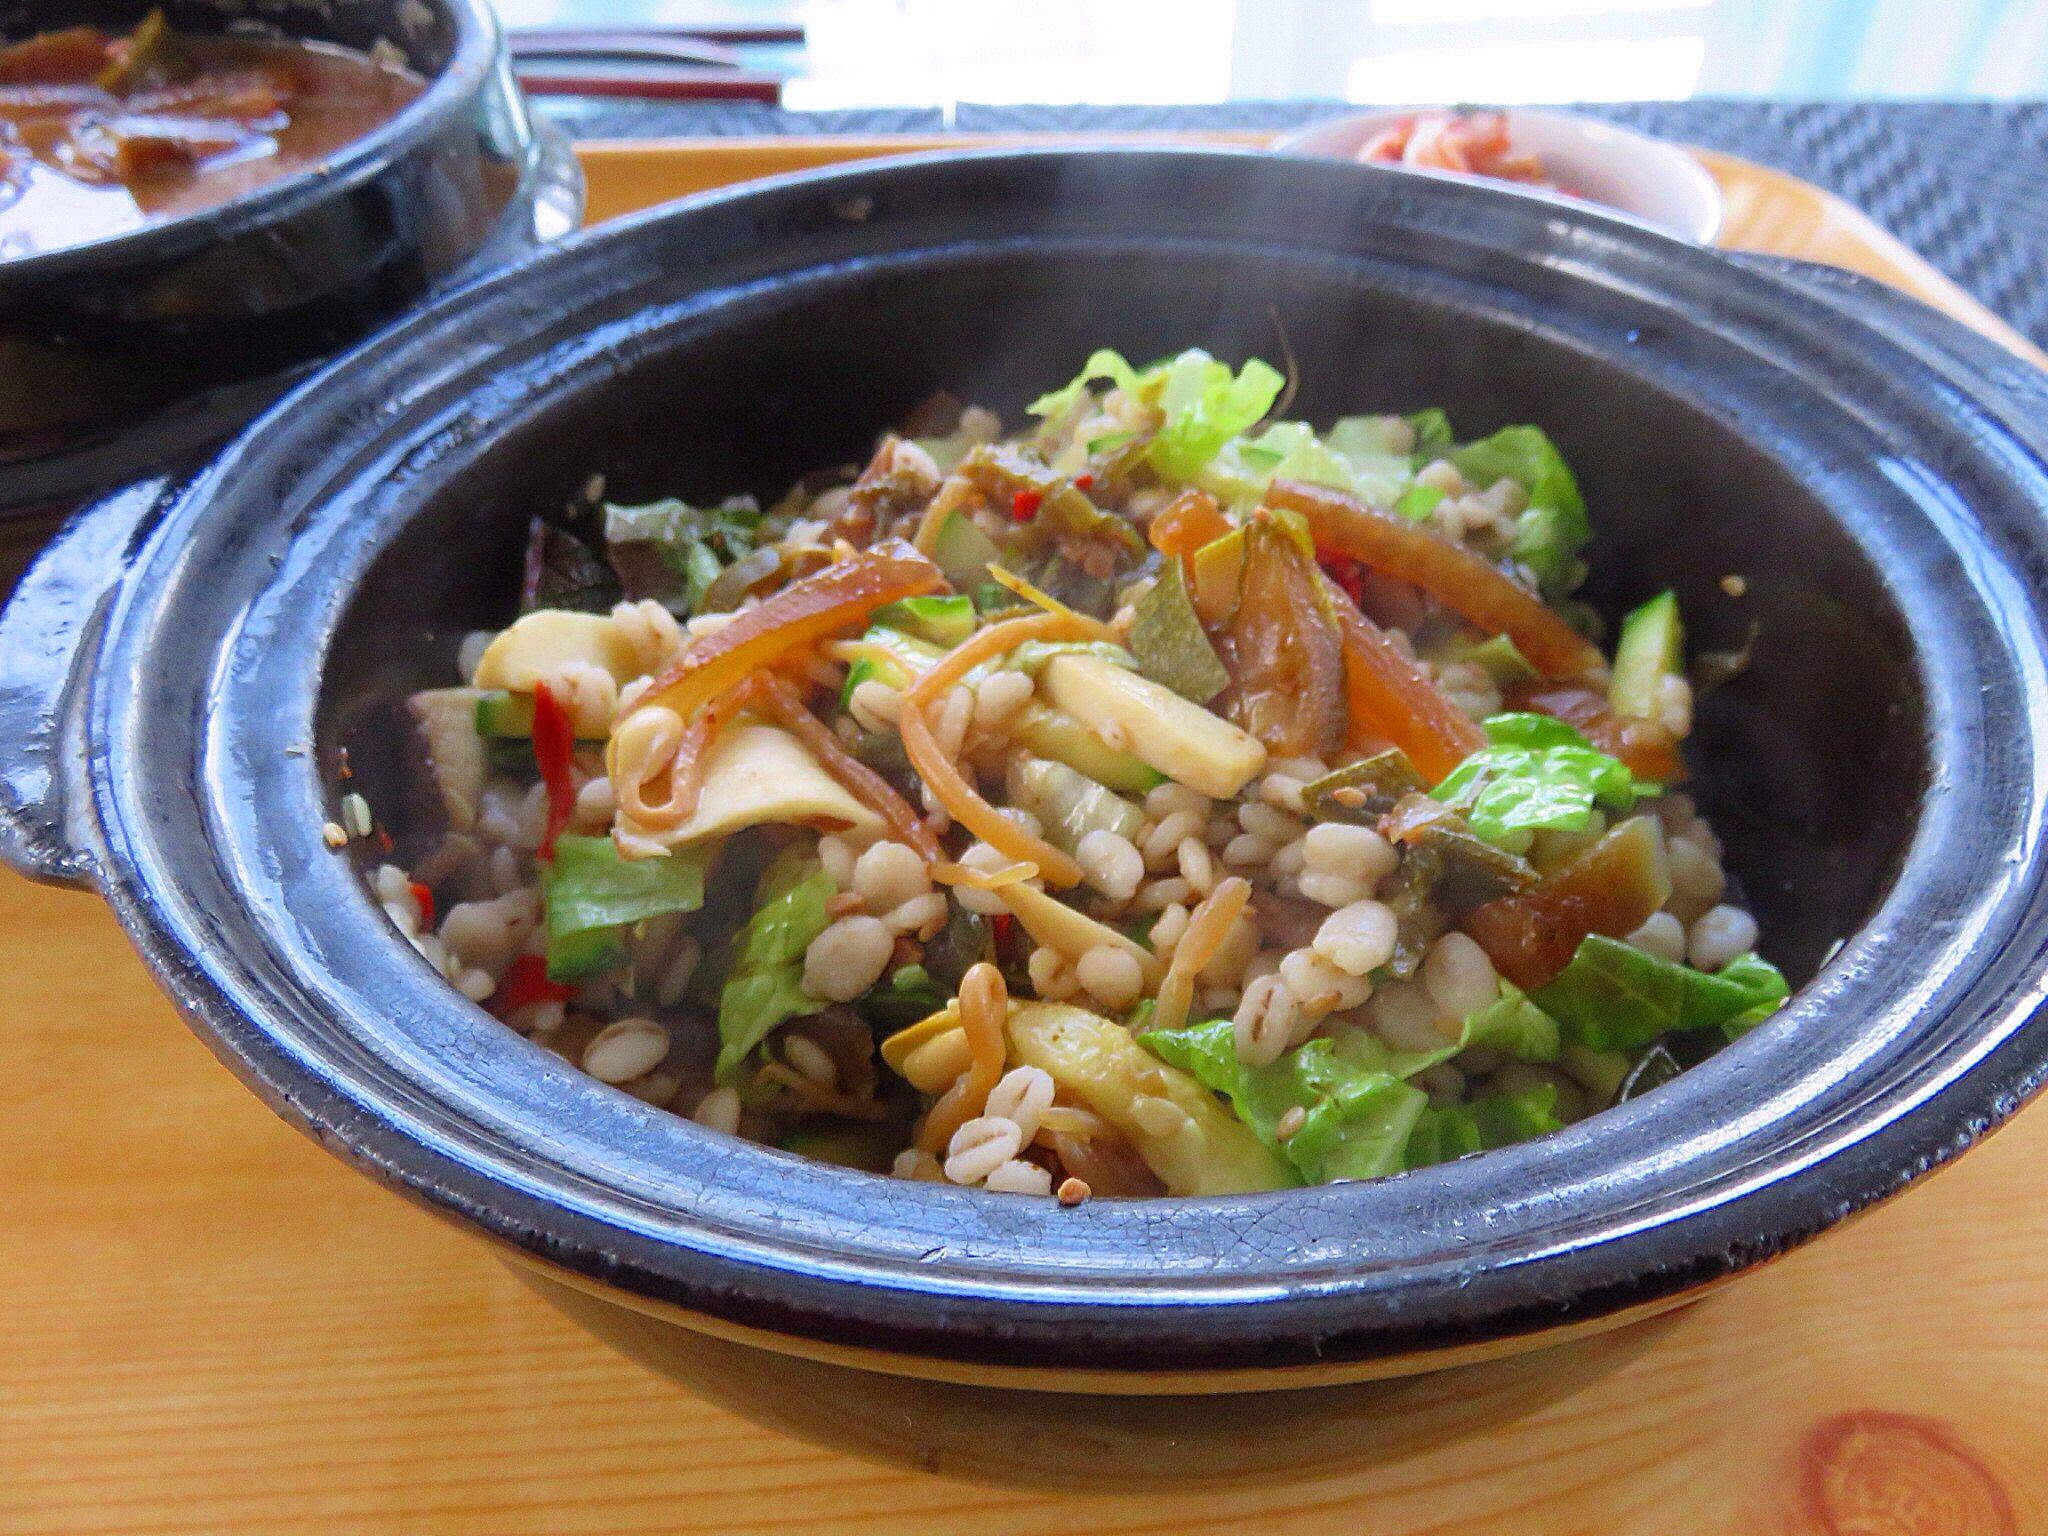 Barley Bibimbob. 납작 보리로 꽁보리밥 지어 강된장 찌개 넣어 비빔밥^^ 으히히히 안씹어도 막 술술 넘어간다.  * 강된장 찌개- 무채를 기름에 볶다, 쌀뜻물, 시래기, 호박, 양파, 파, 고추에 된장 푸욱 떠넣고 멸칫가루로 맛내어 낮은불에 은근히 오래 끓이다 깻잎 송송 썰어 넣어 밥에 비벼드심.  *보리밥에 호박과 버섯 볶은것과 상추 송송 썰어 넣고 강됀장과 함께 쓱쓱 비벼 비벼